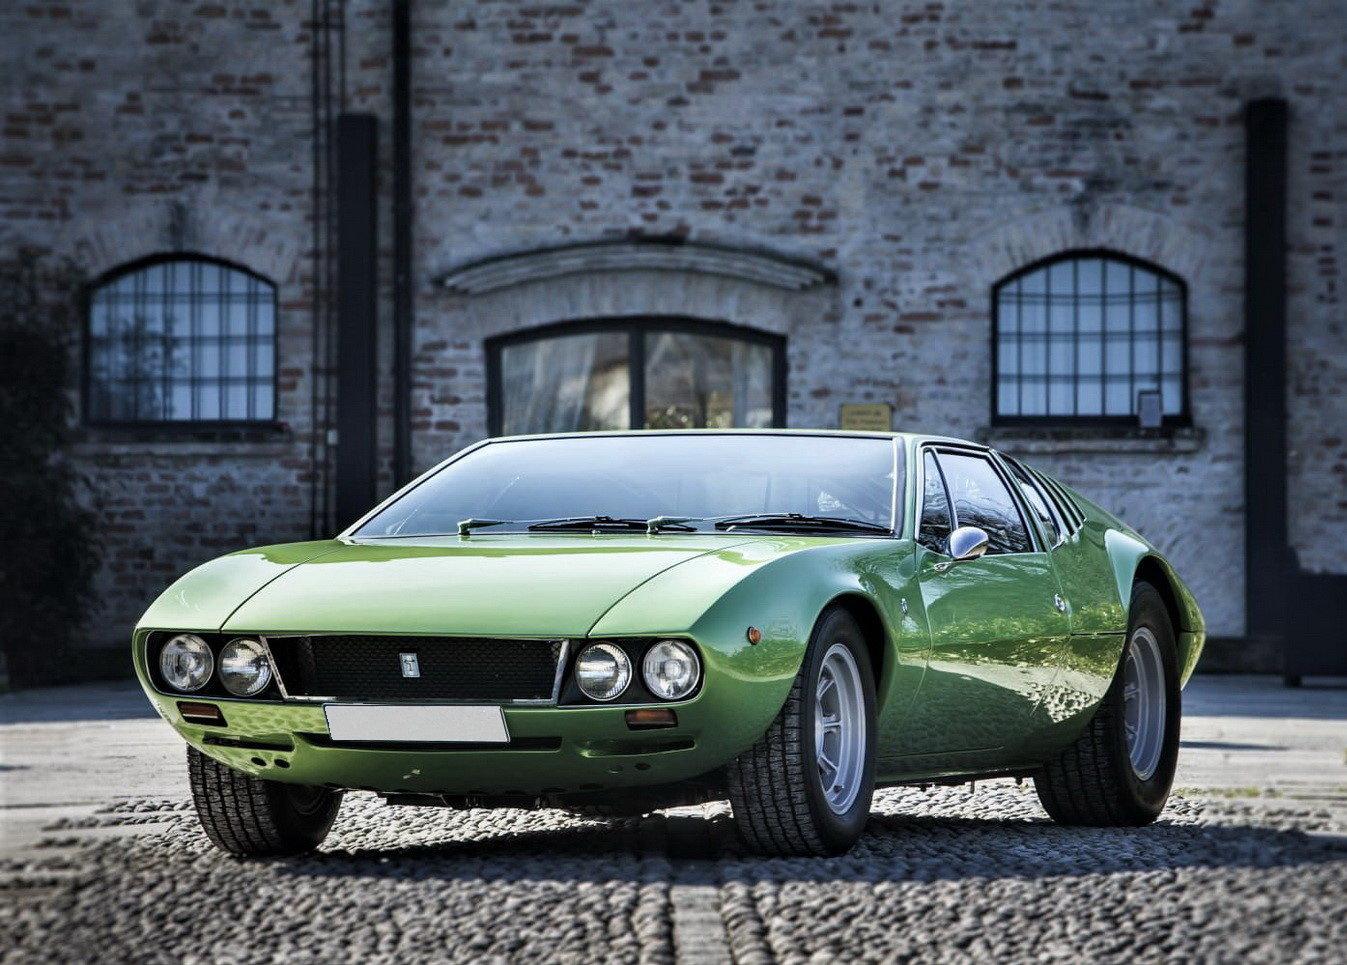 1969 De Tomaso Mangusta For Sale (picture 1 of 6)